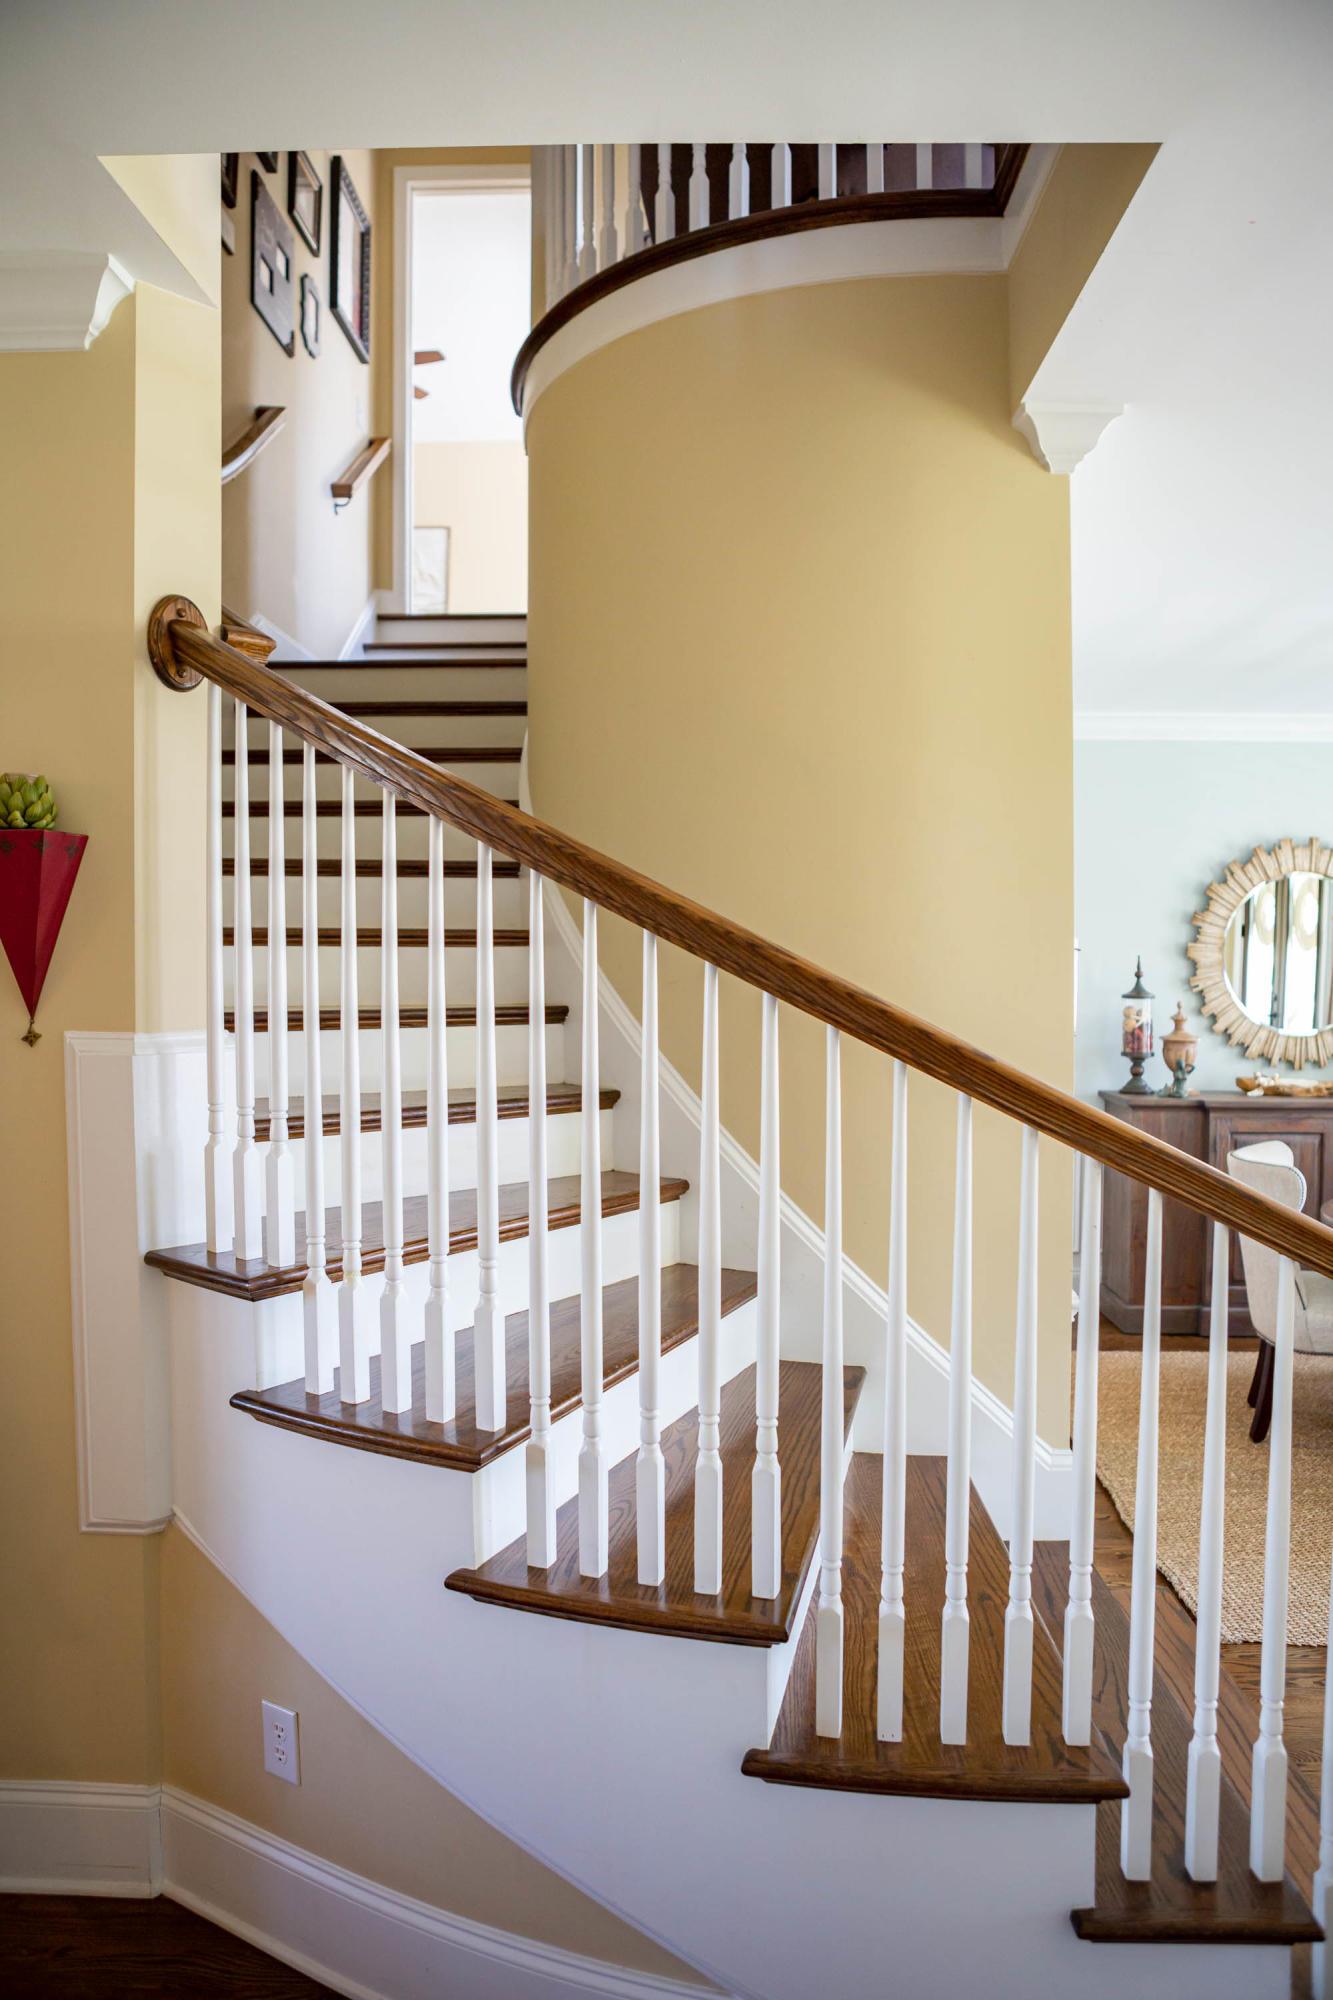 Dunes West Homes For Sale - 3216 Hatchway, Mount Pleasant, SC - 32